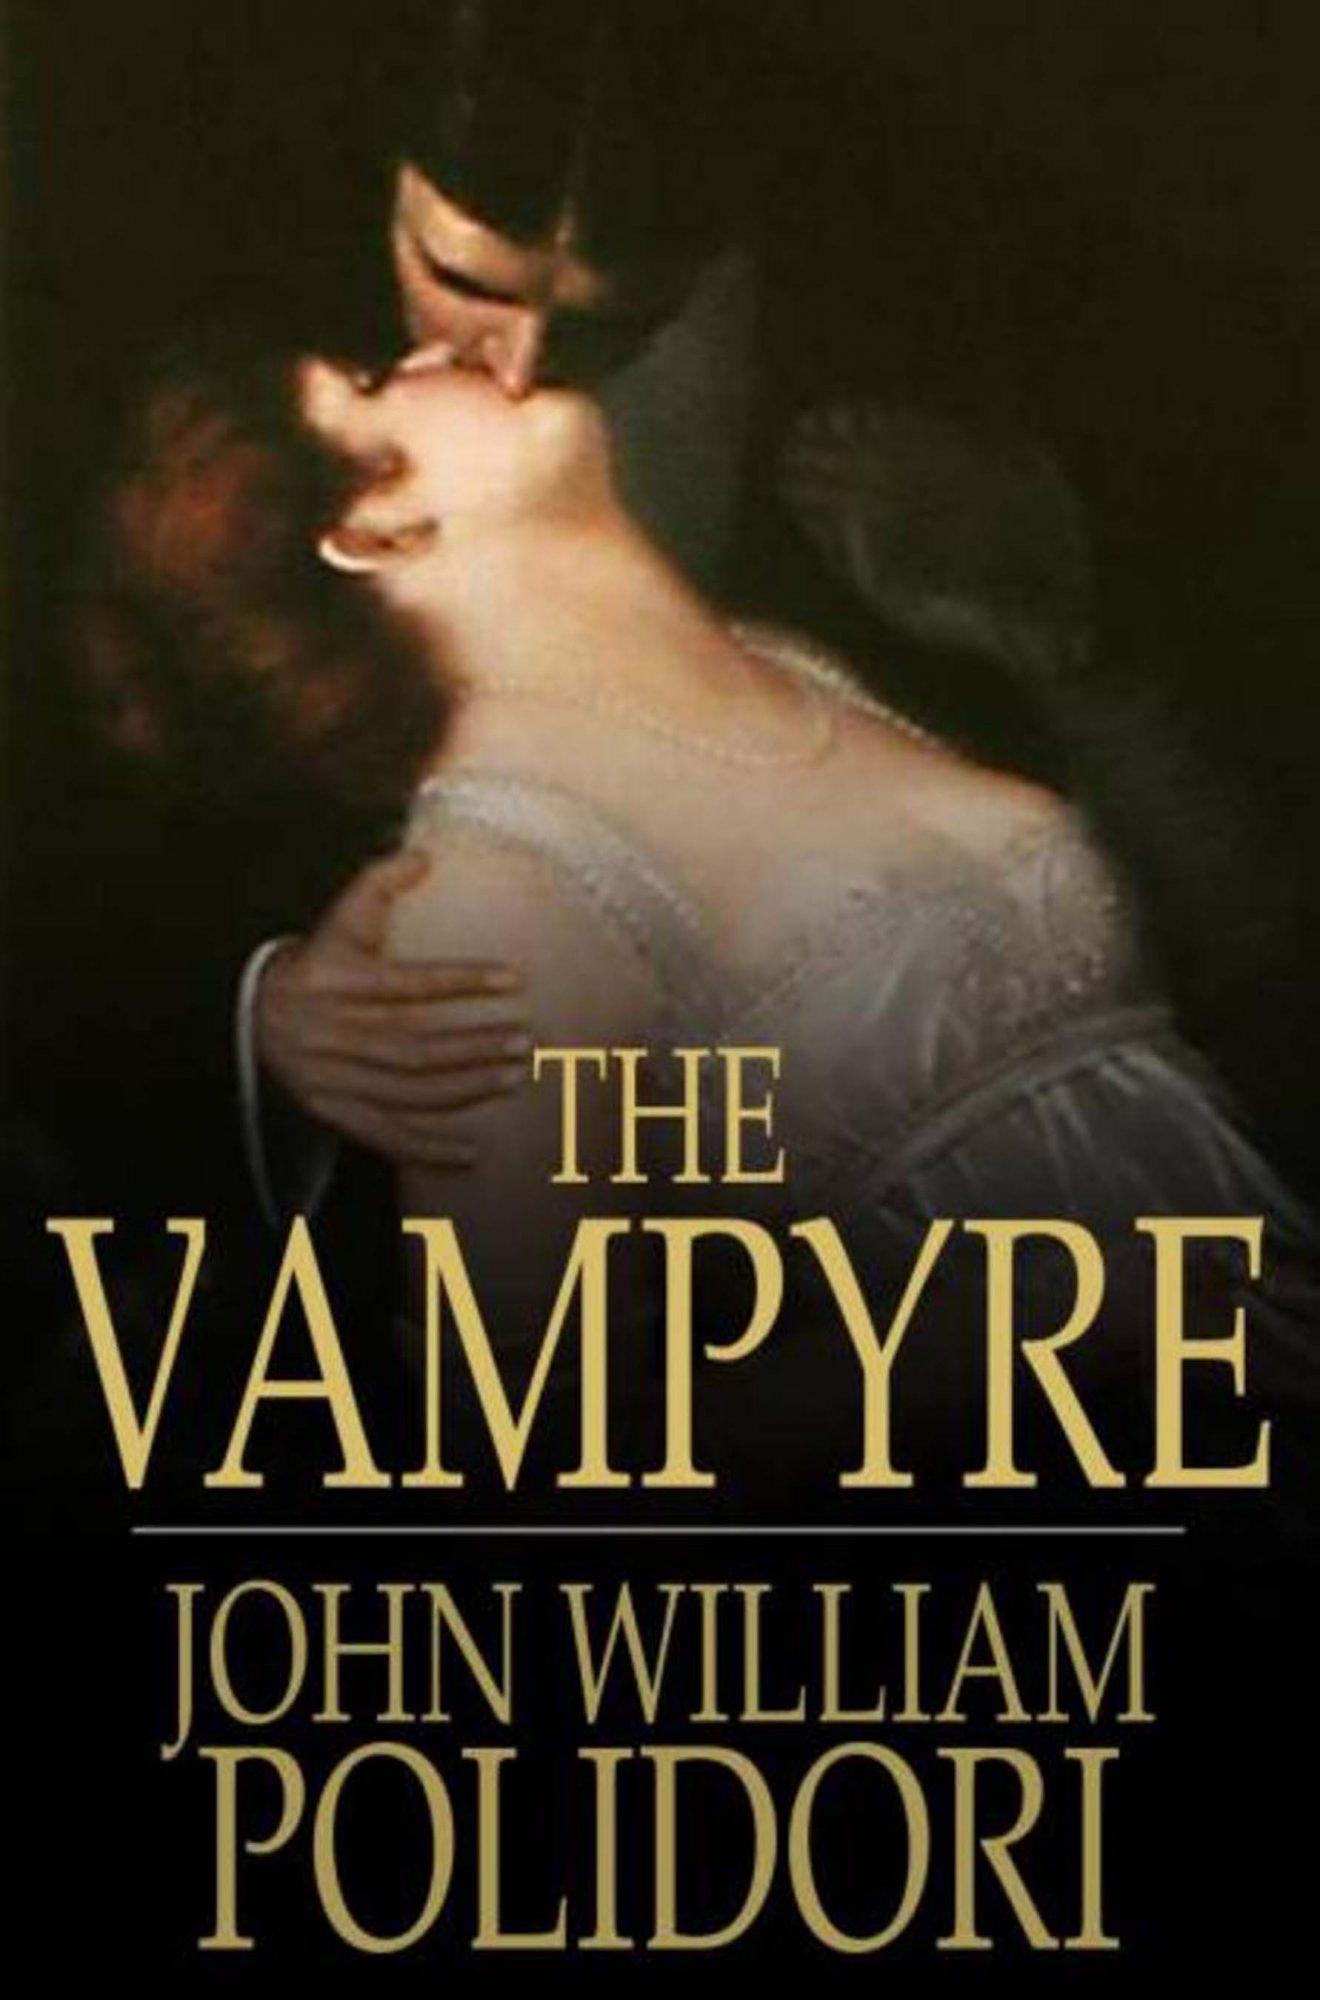 The VampyreShort story by John William Polidori Henry Colburn